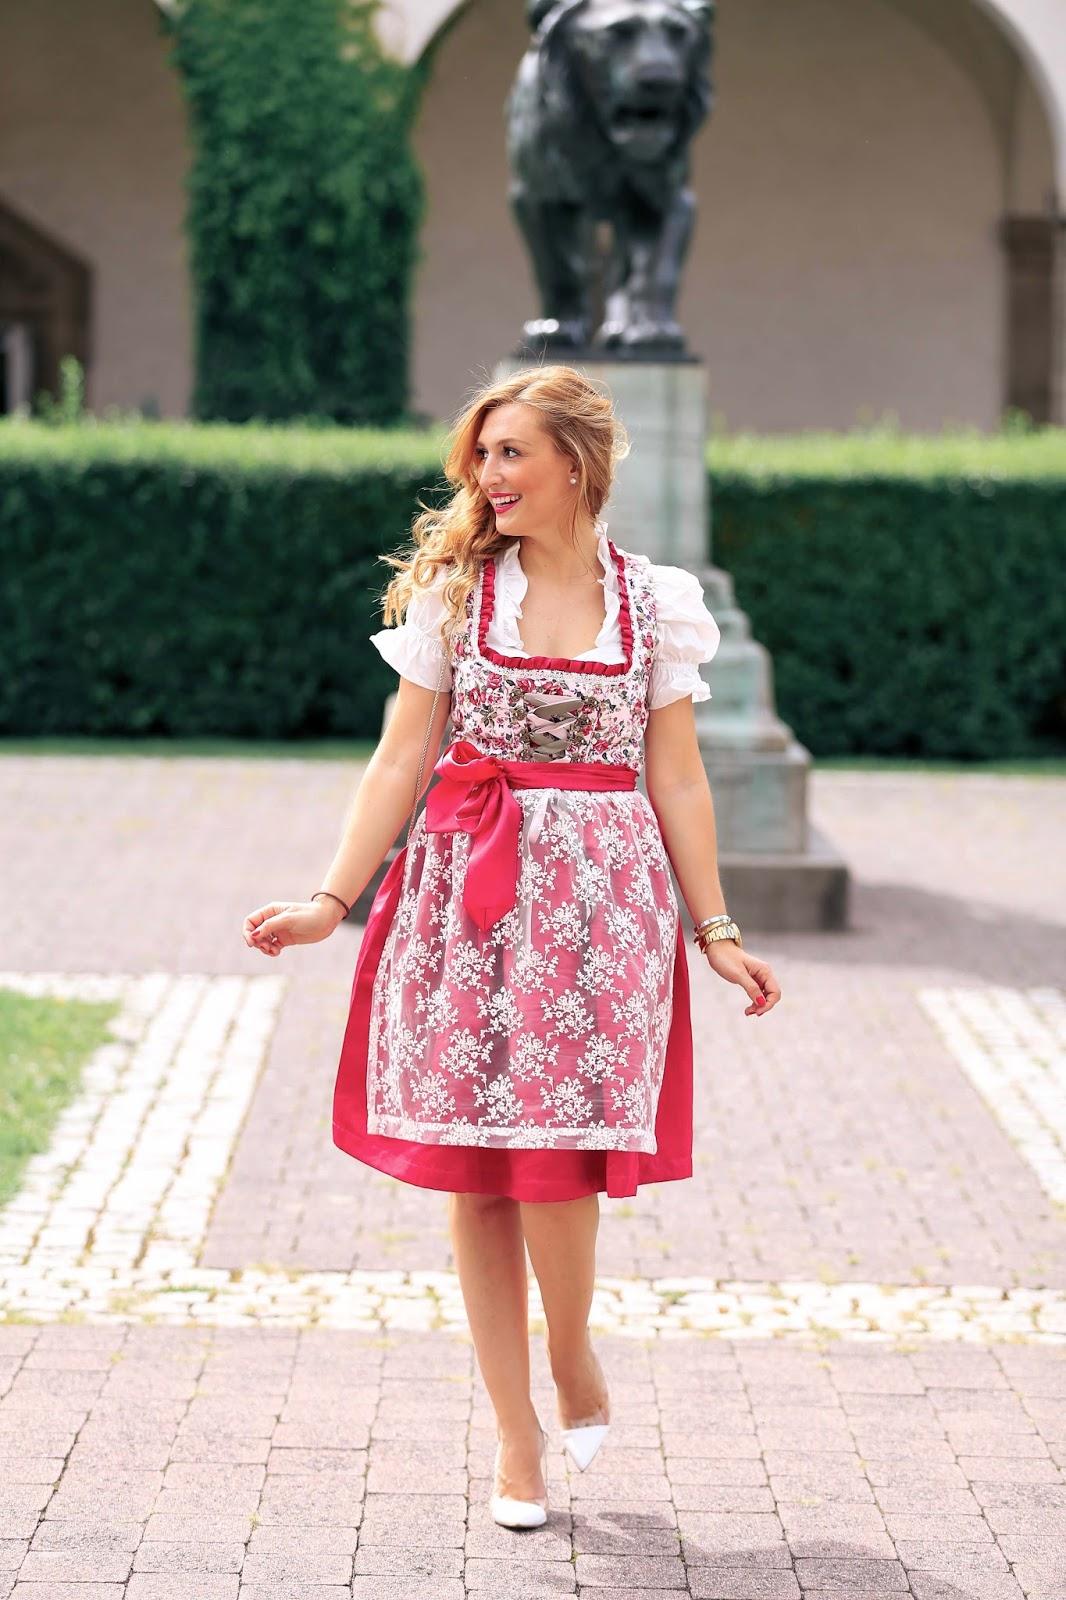 fashionstylebyjohanna-fashionblog-muenchen-styleblog-munich-blogger-deutschland-fashionblogger-bloggerdeutschland-lifestyleblog-modeblog-germanblogger-dirndl-inspiration